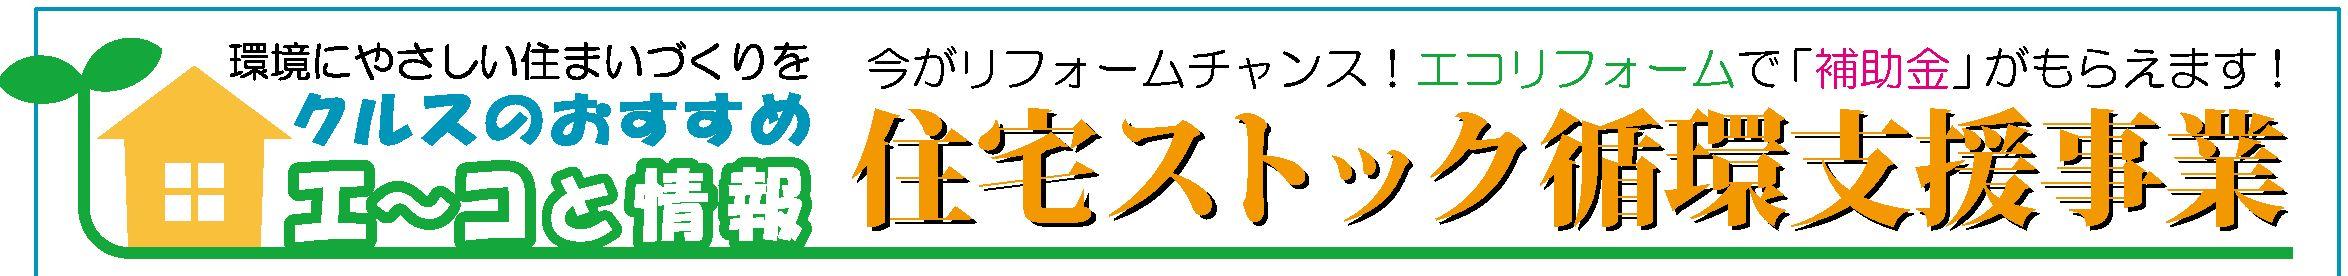 KuraSi-natu-sin103-19.jpg